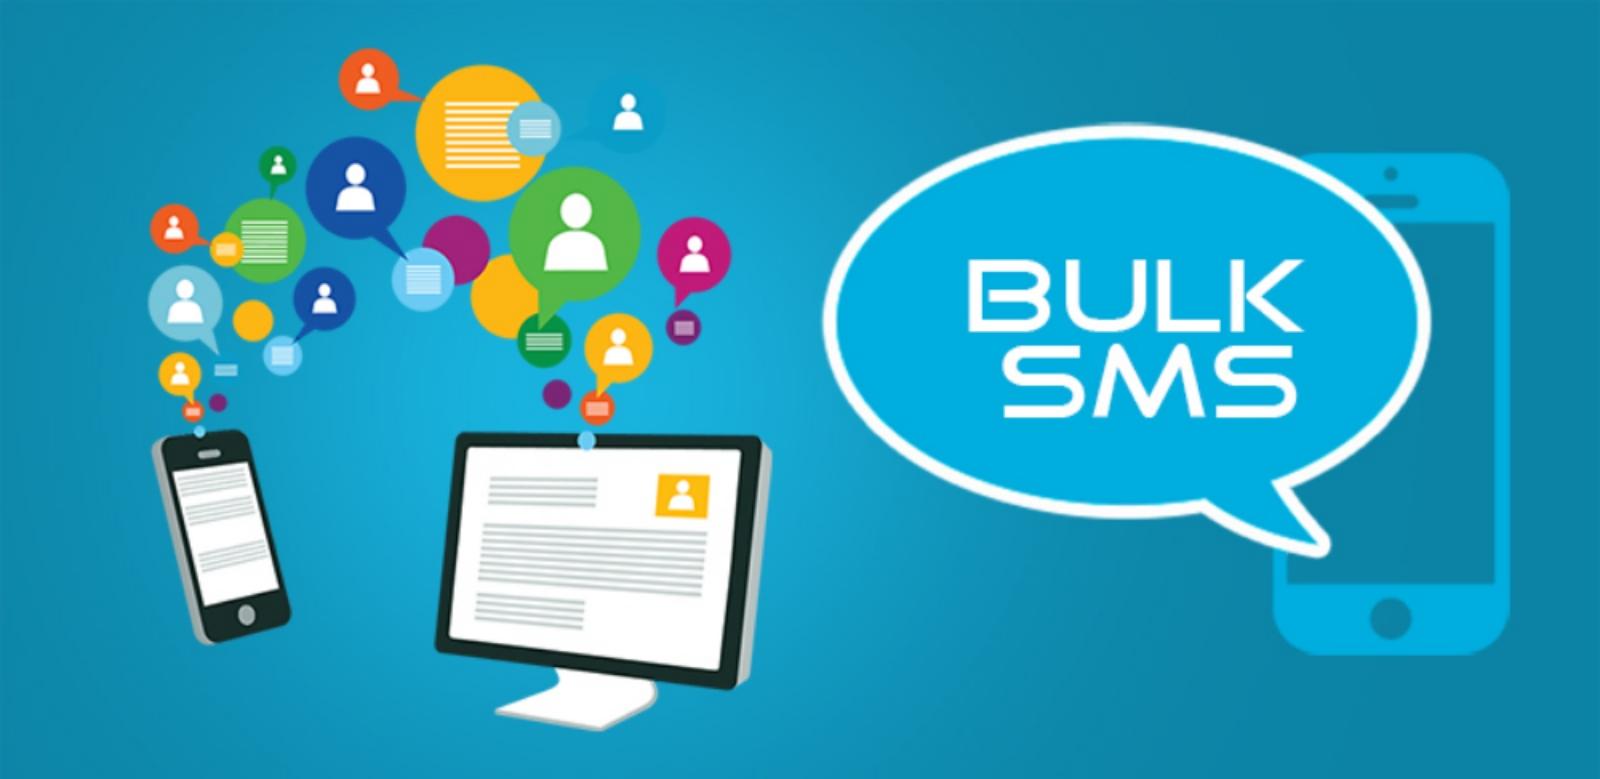 How Bulk SMS Marketing Help Your Business? - MrDigito